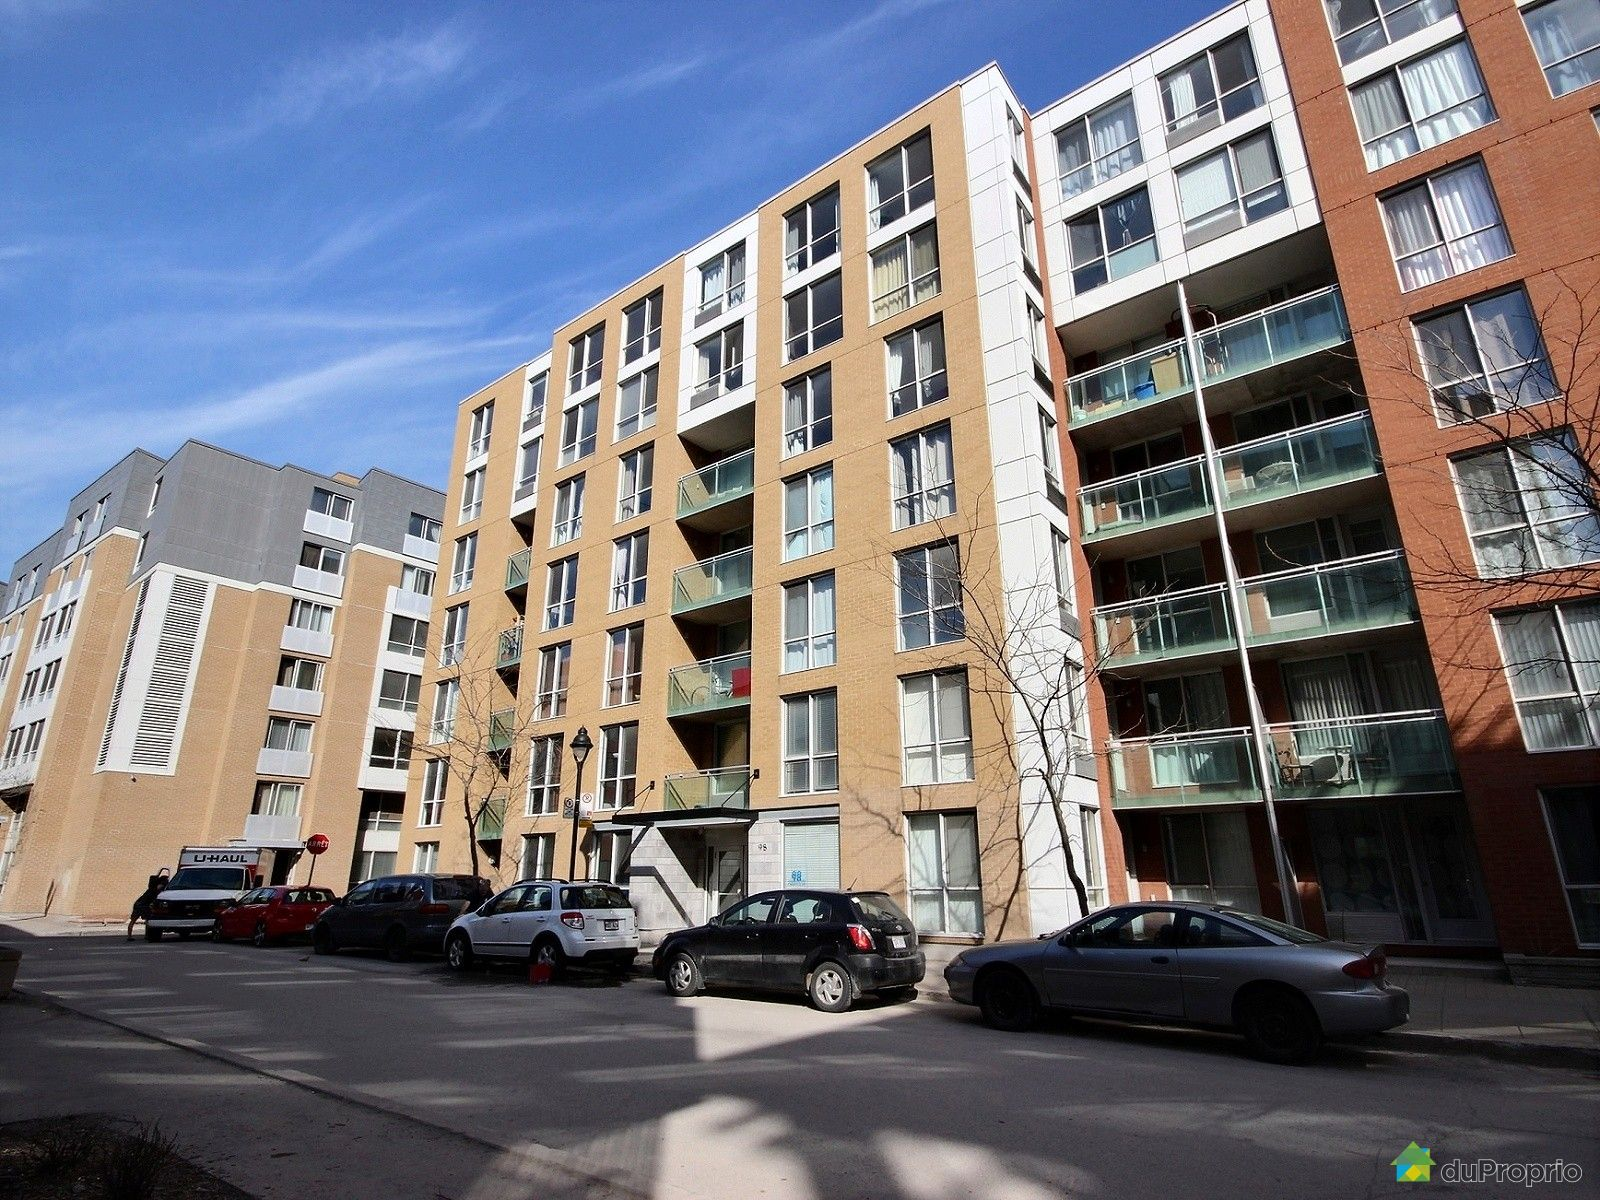 Condo vendre montr al 659 98 rue charlotte immobilier for Piscine exterieur montreal